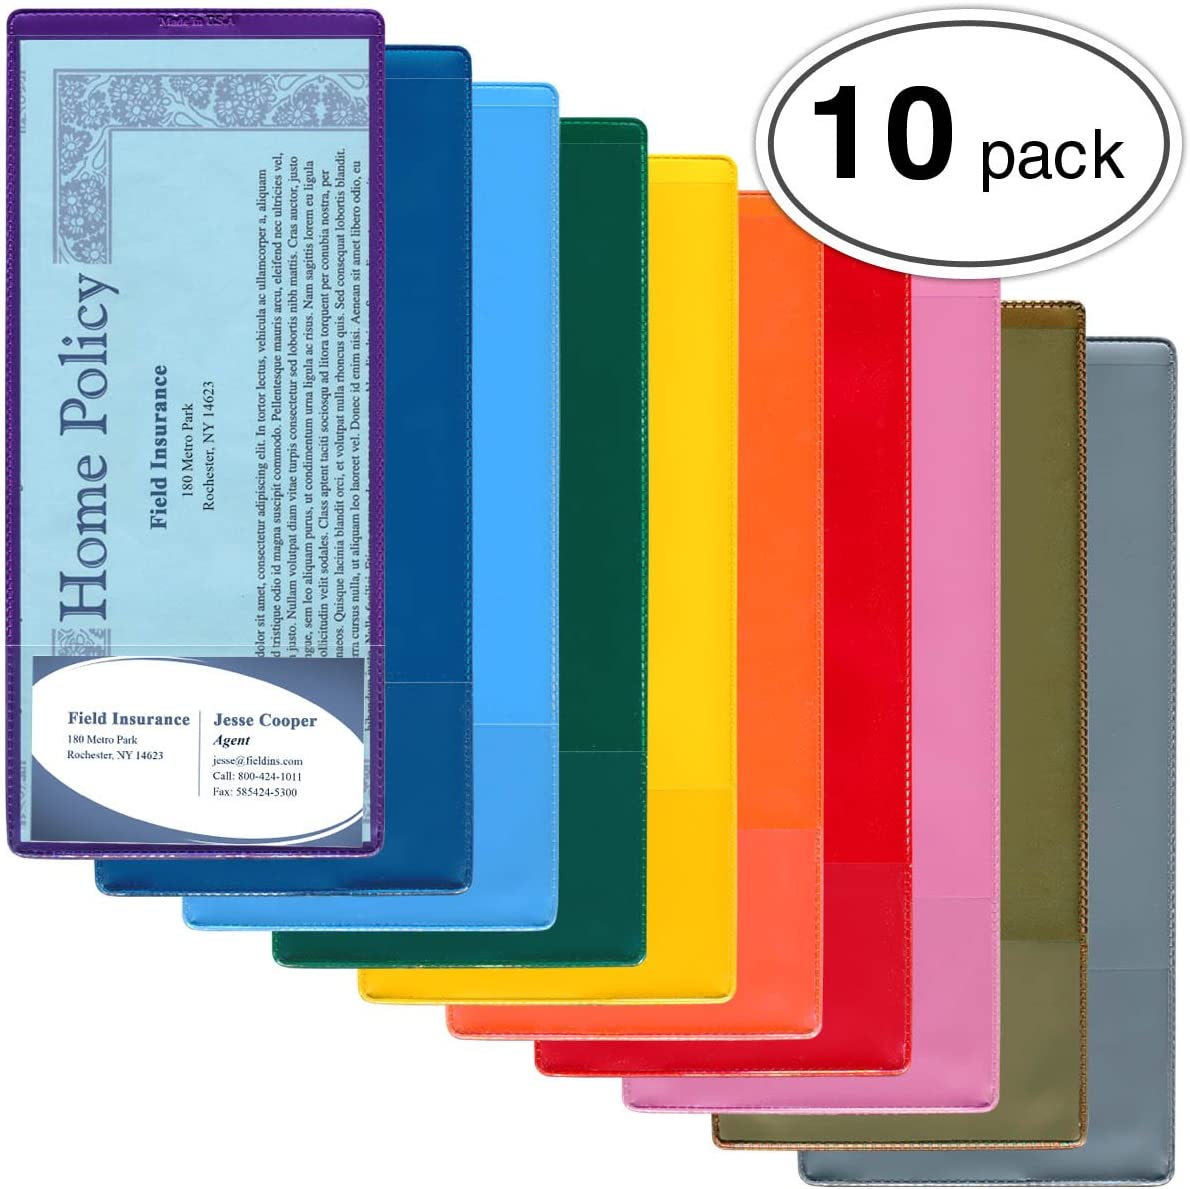 RFS20VP StoreSMART Auto Insurance /& ID Card Holders 10-PACK Variety Colors